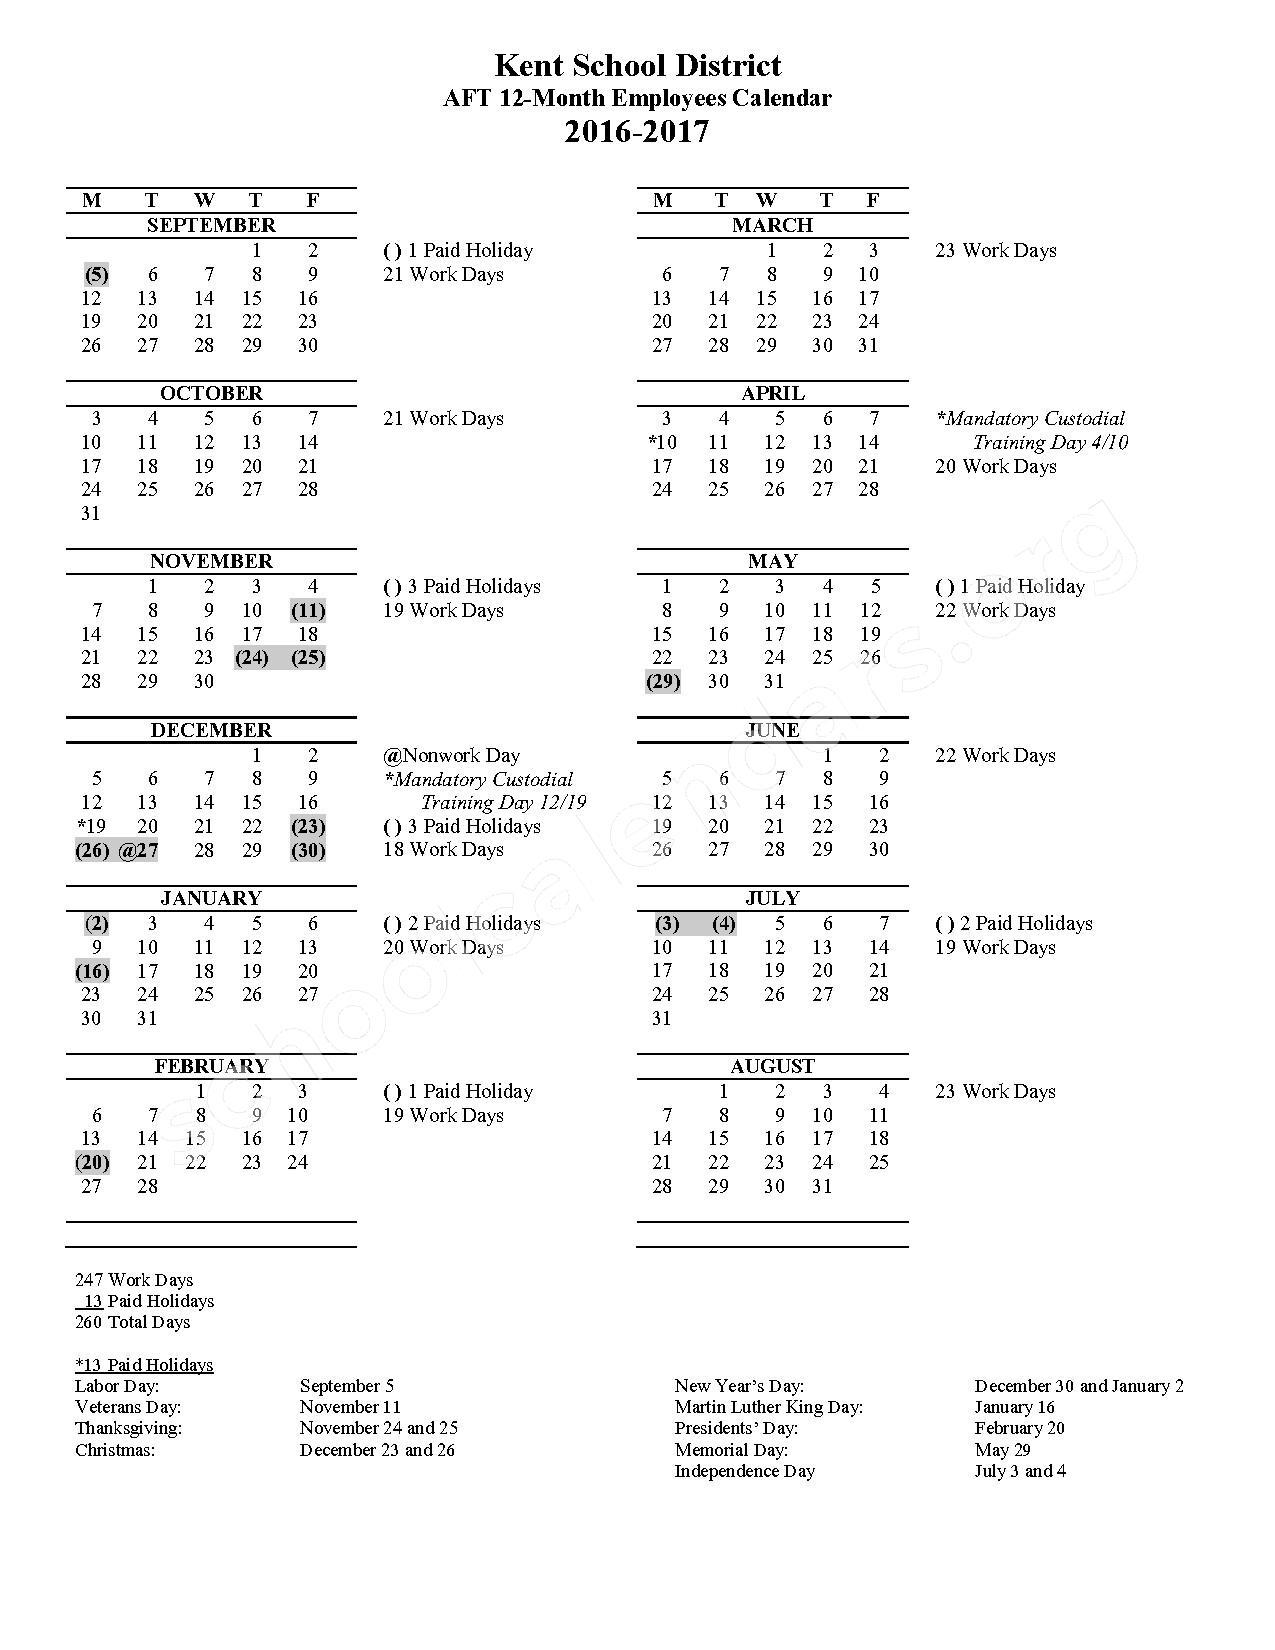 2016 - 2017 AFT (Maintenance/Custodial) Employees Calendar – Meadow Ridge Elementary School – page 1